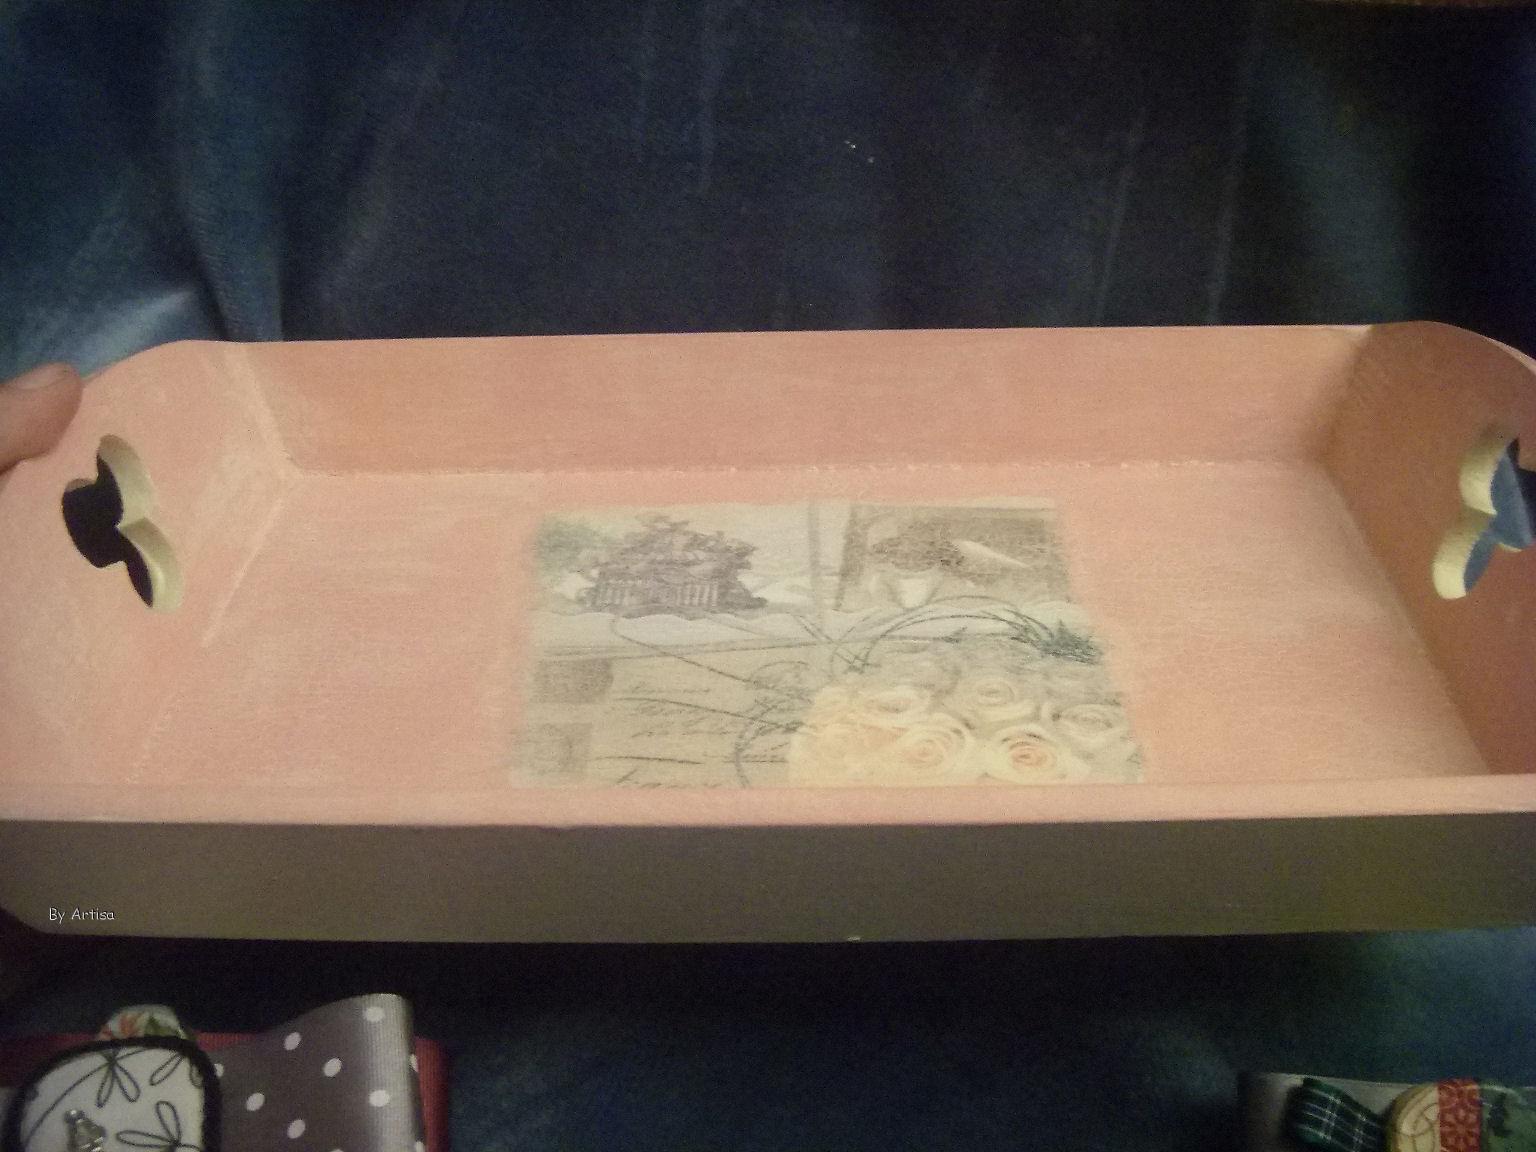 Un poquito de todo bandeja de madera decorada for Bandejas de madera decoradas